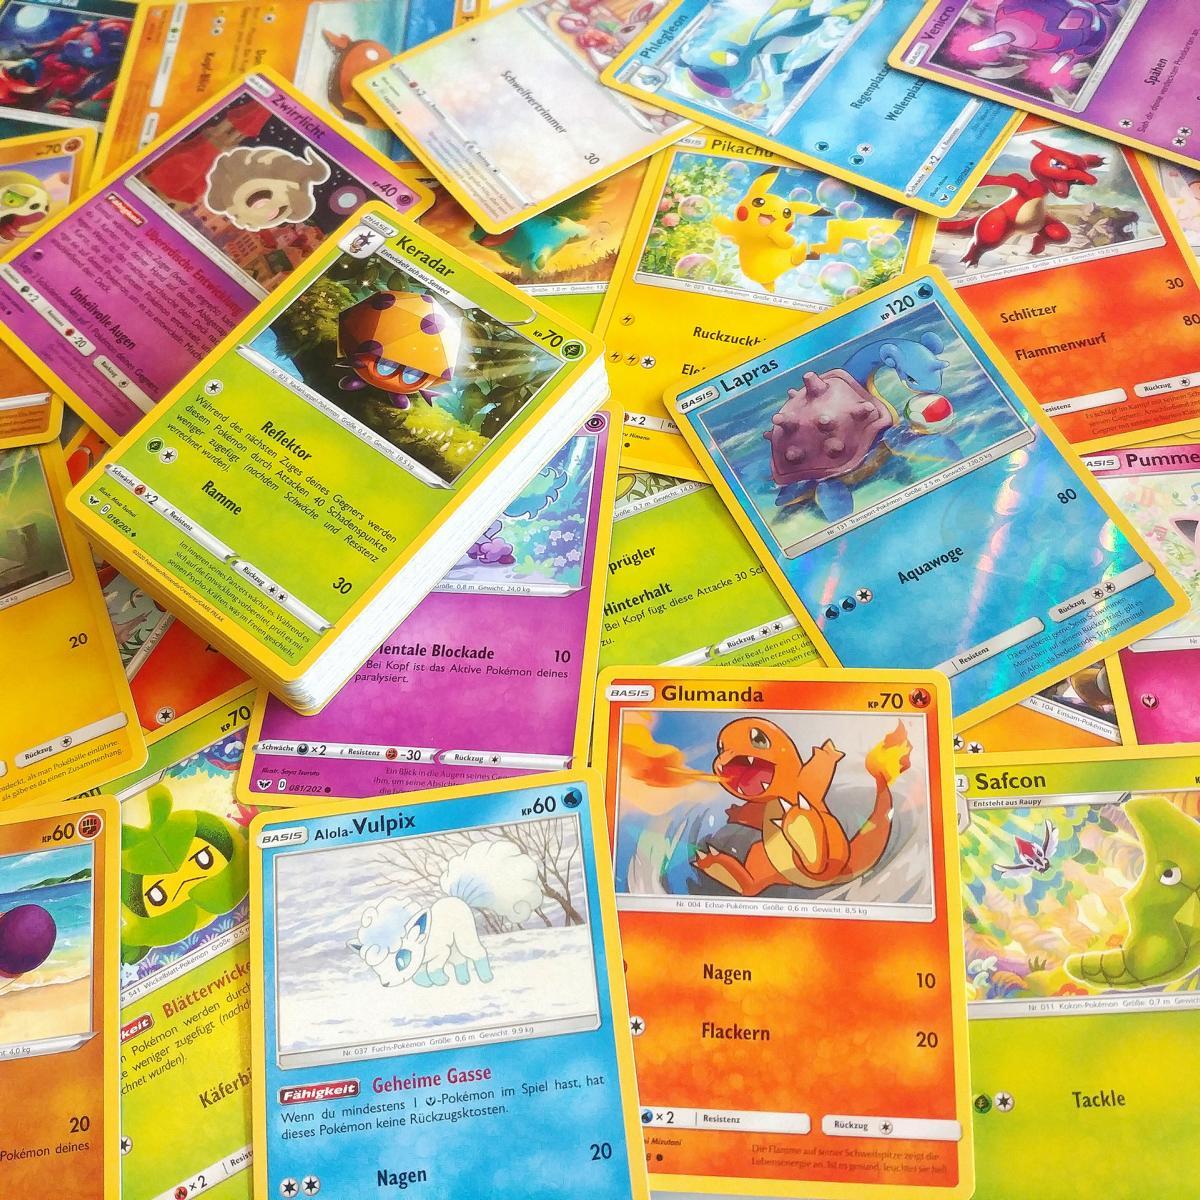 50 Deutsche Pokemon Karten inkl. 1 Holo Karte